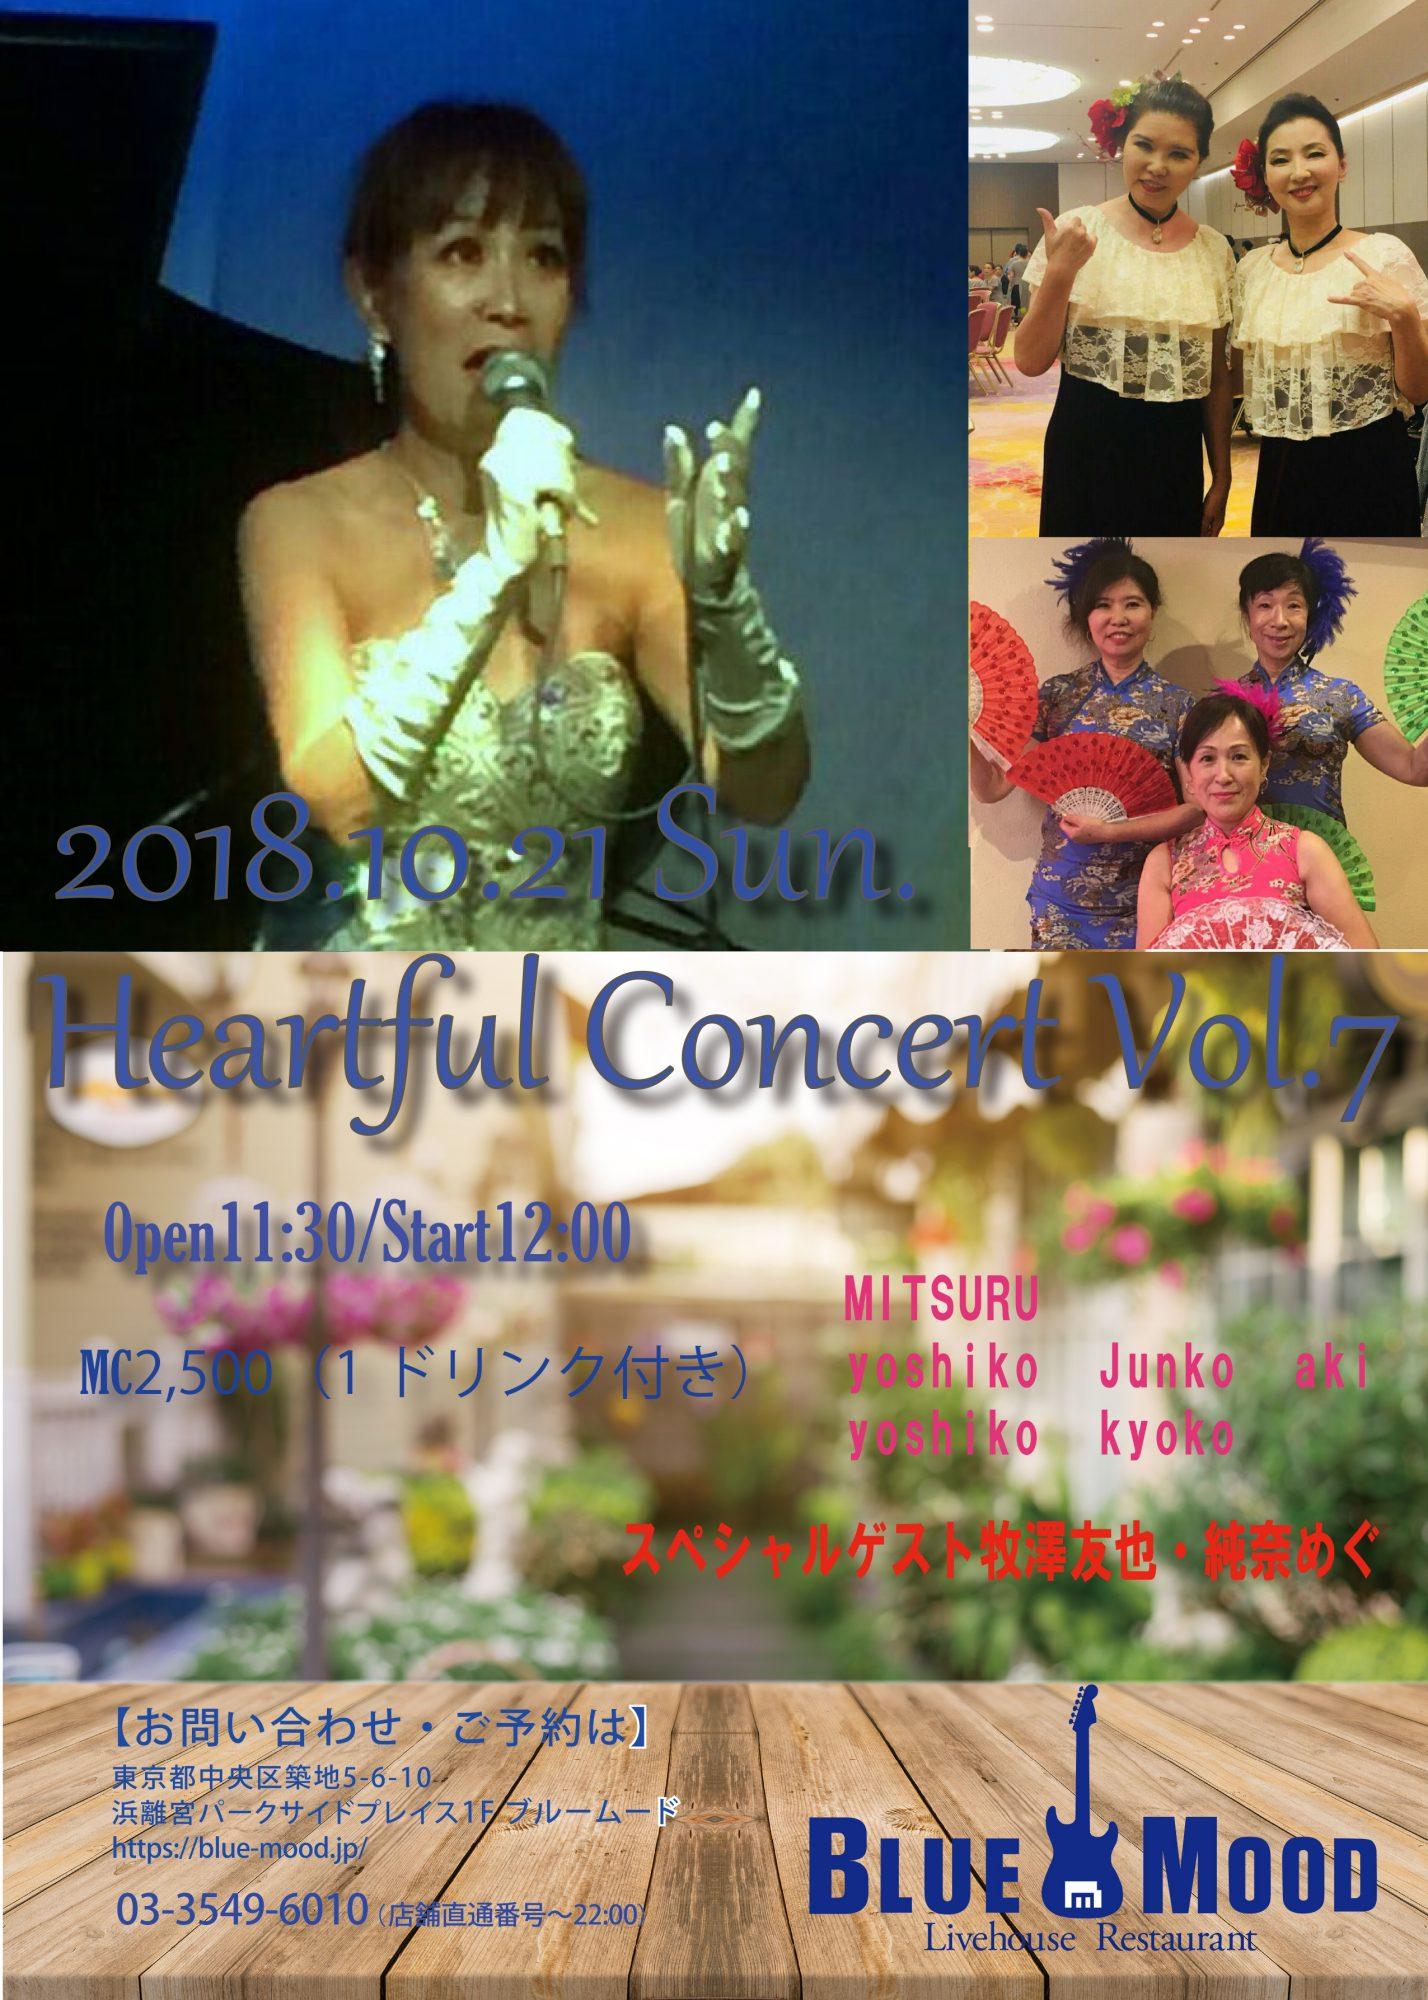 Heartful Concert Vol.7